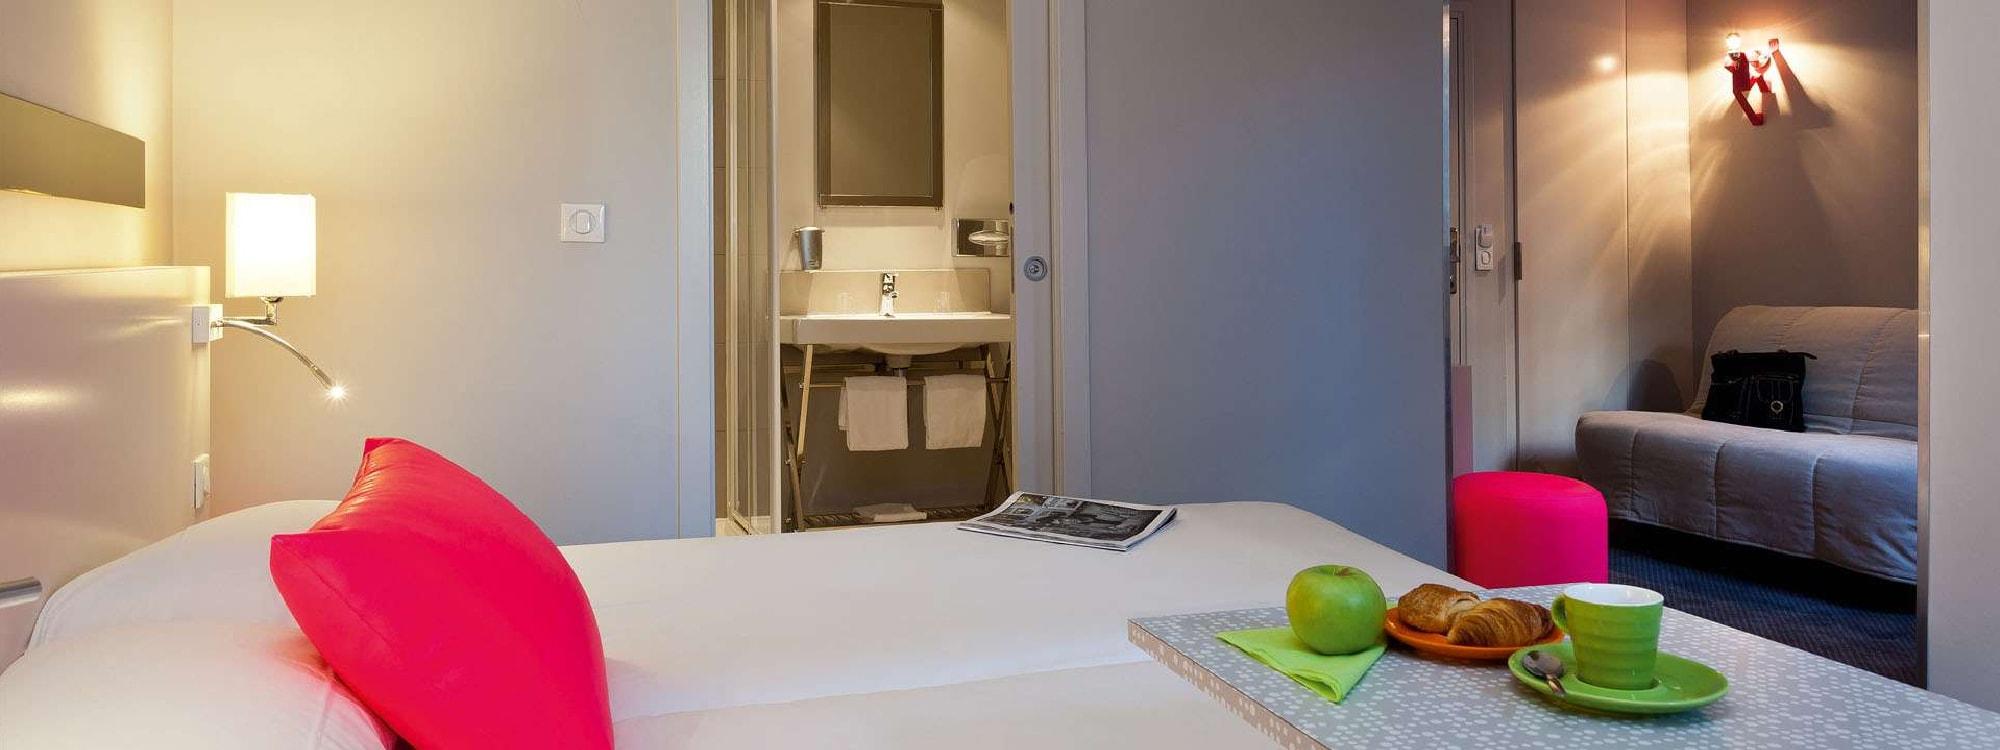 Hotel Antibes Ibis